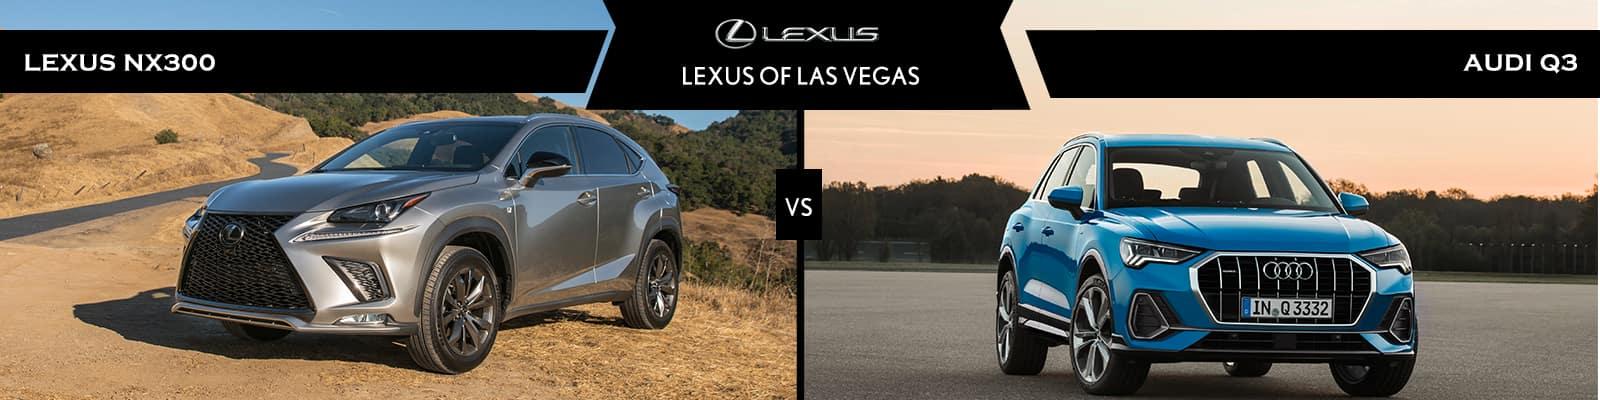 Lexus NX 300 vs Audi Q3